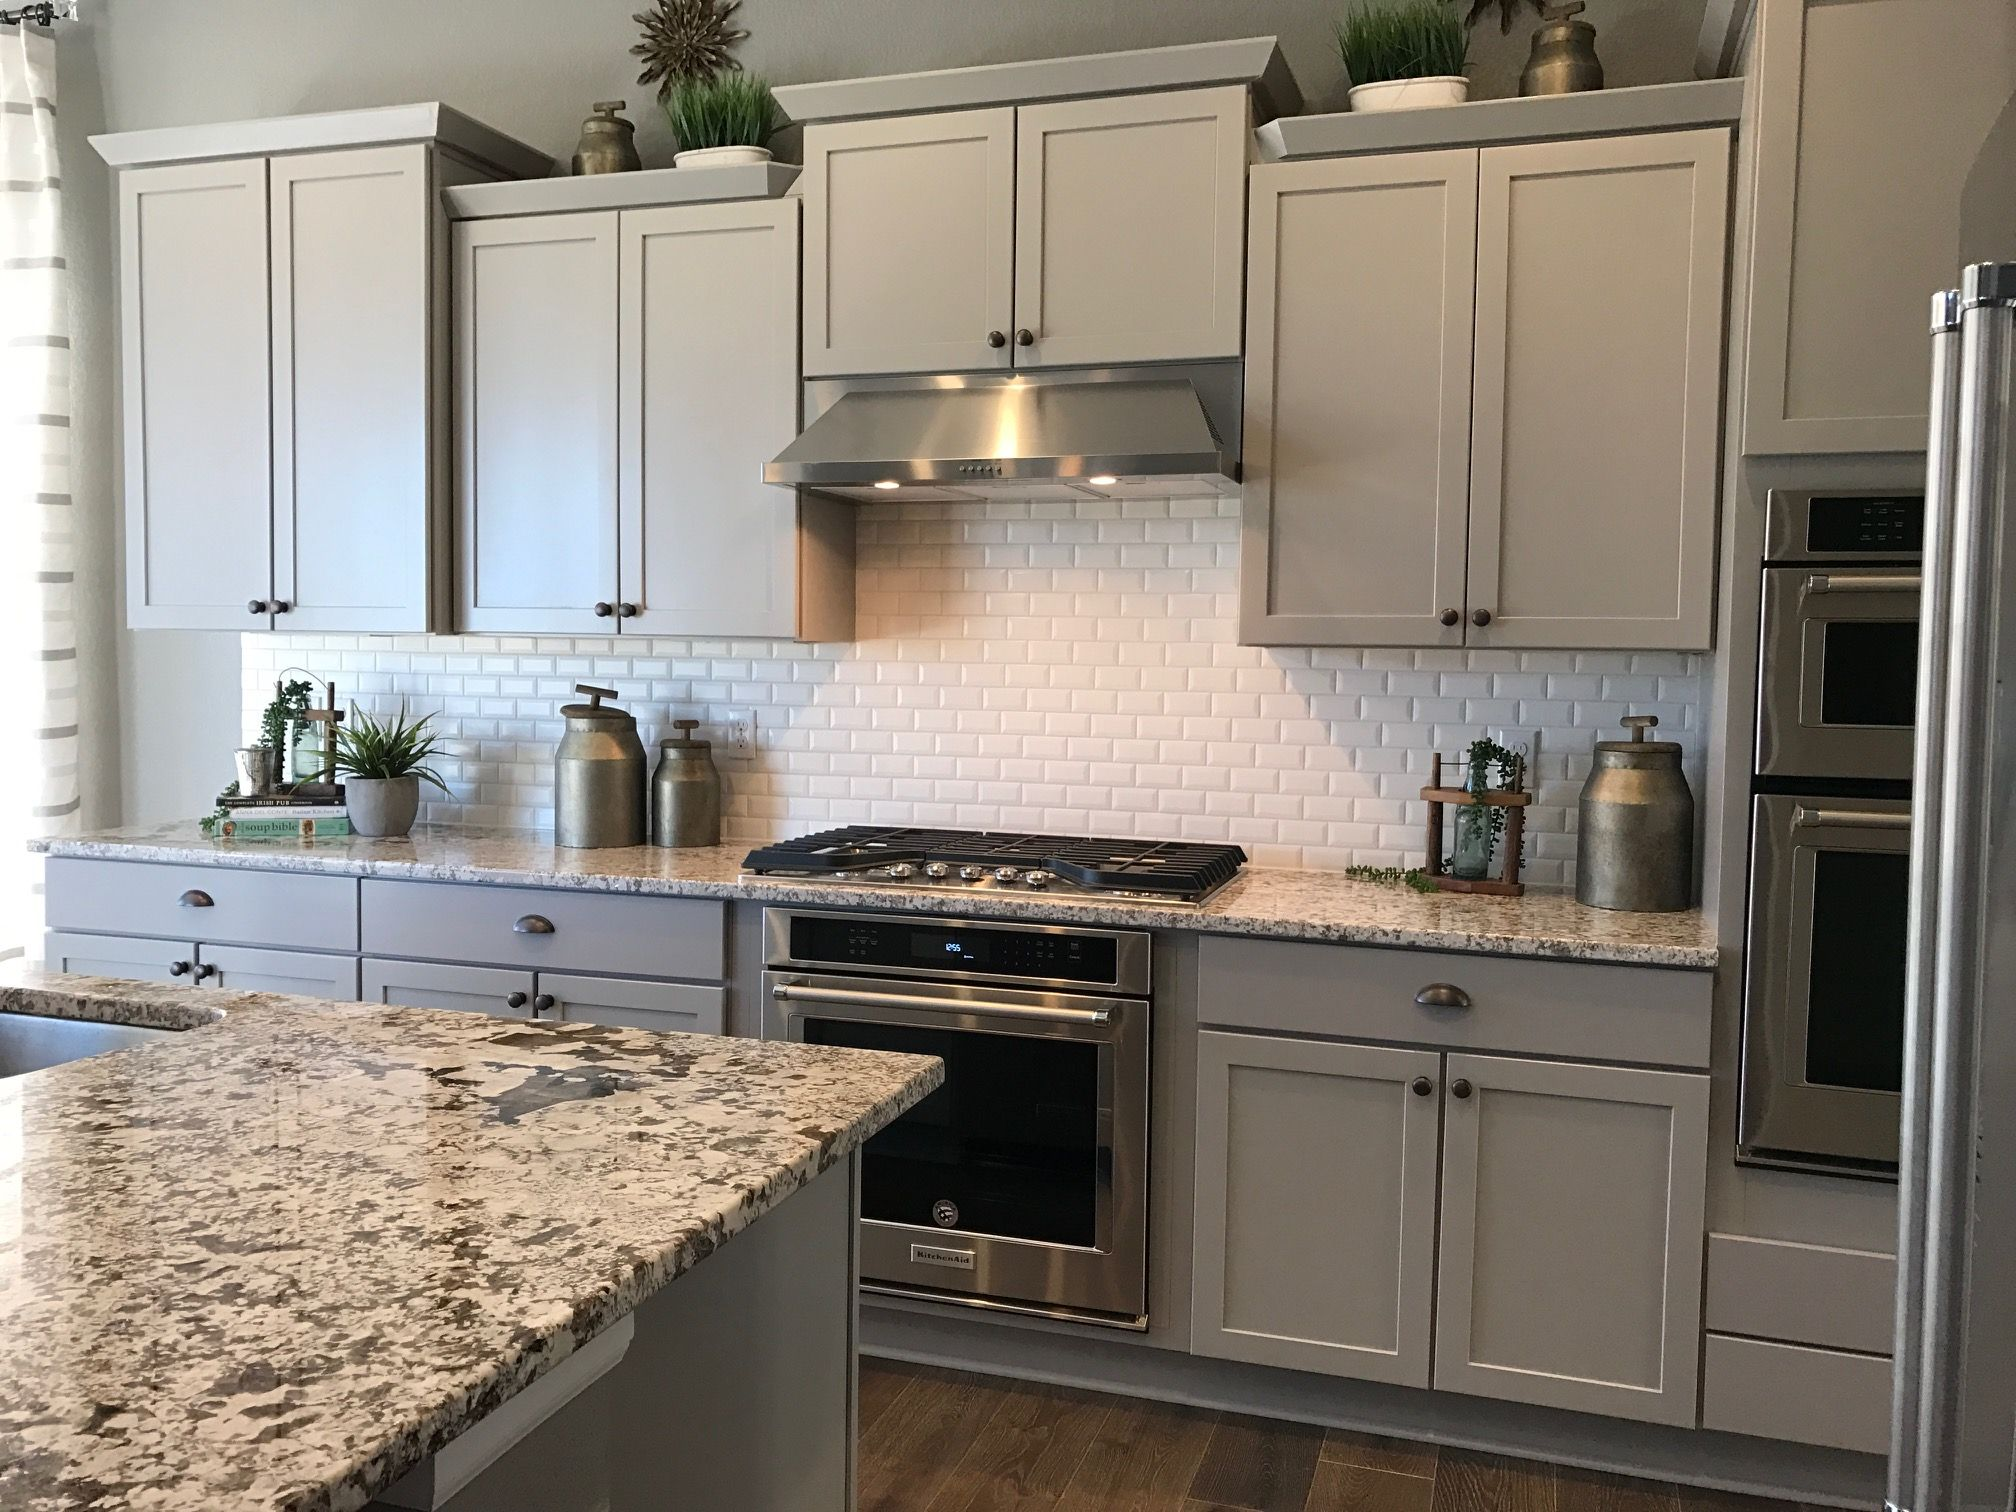 merillat portrait shale cabinets with bianco antico granite and